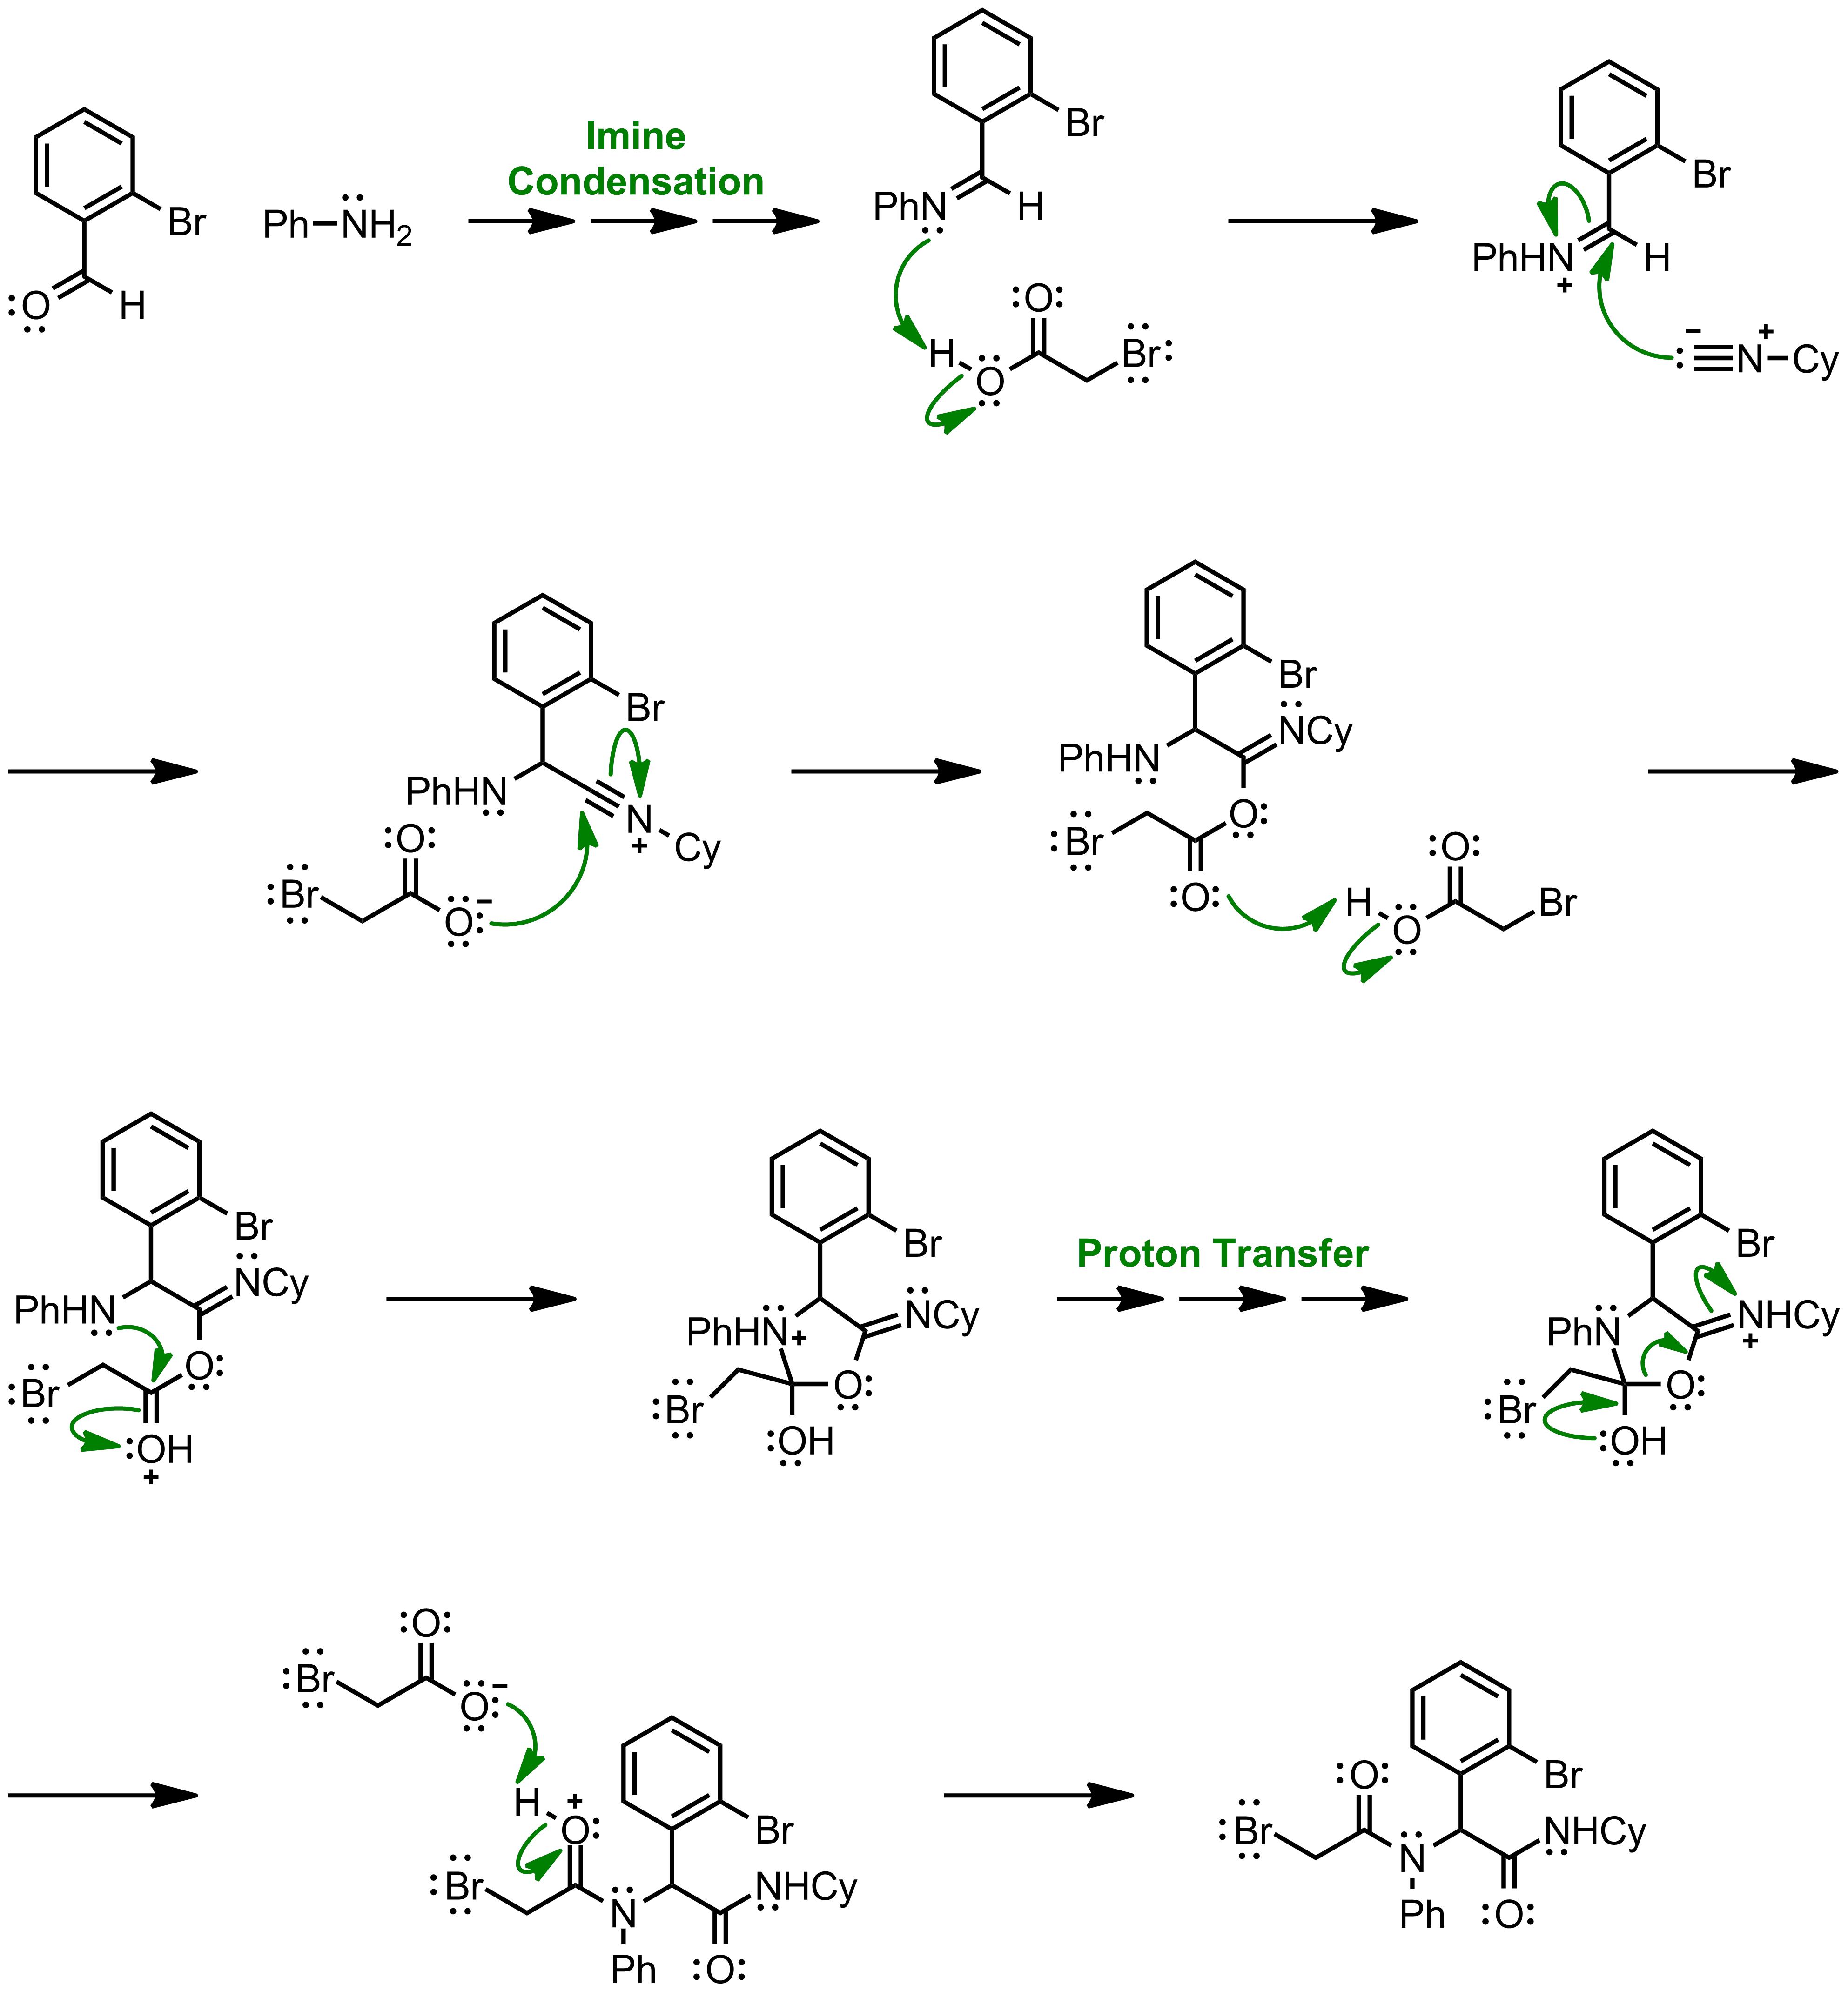 Mechanism of the Ugi Reaction